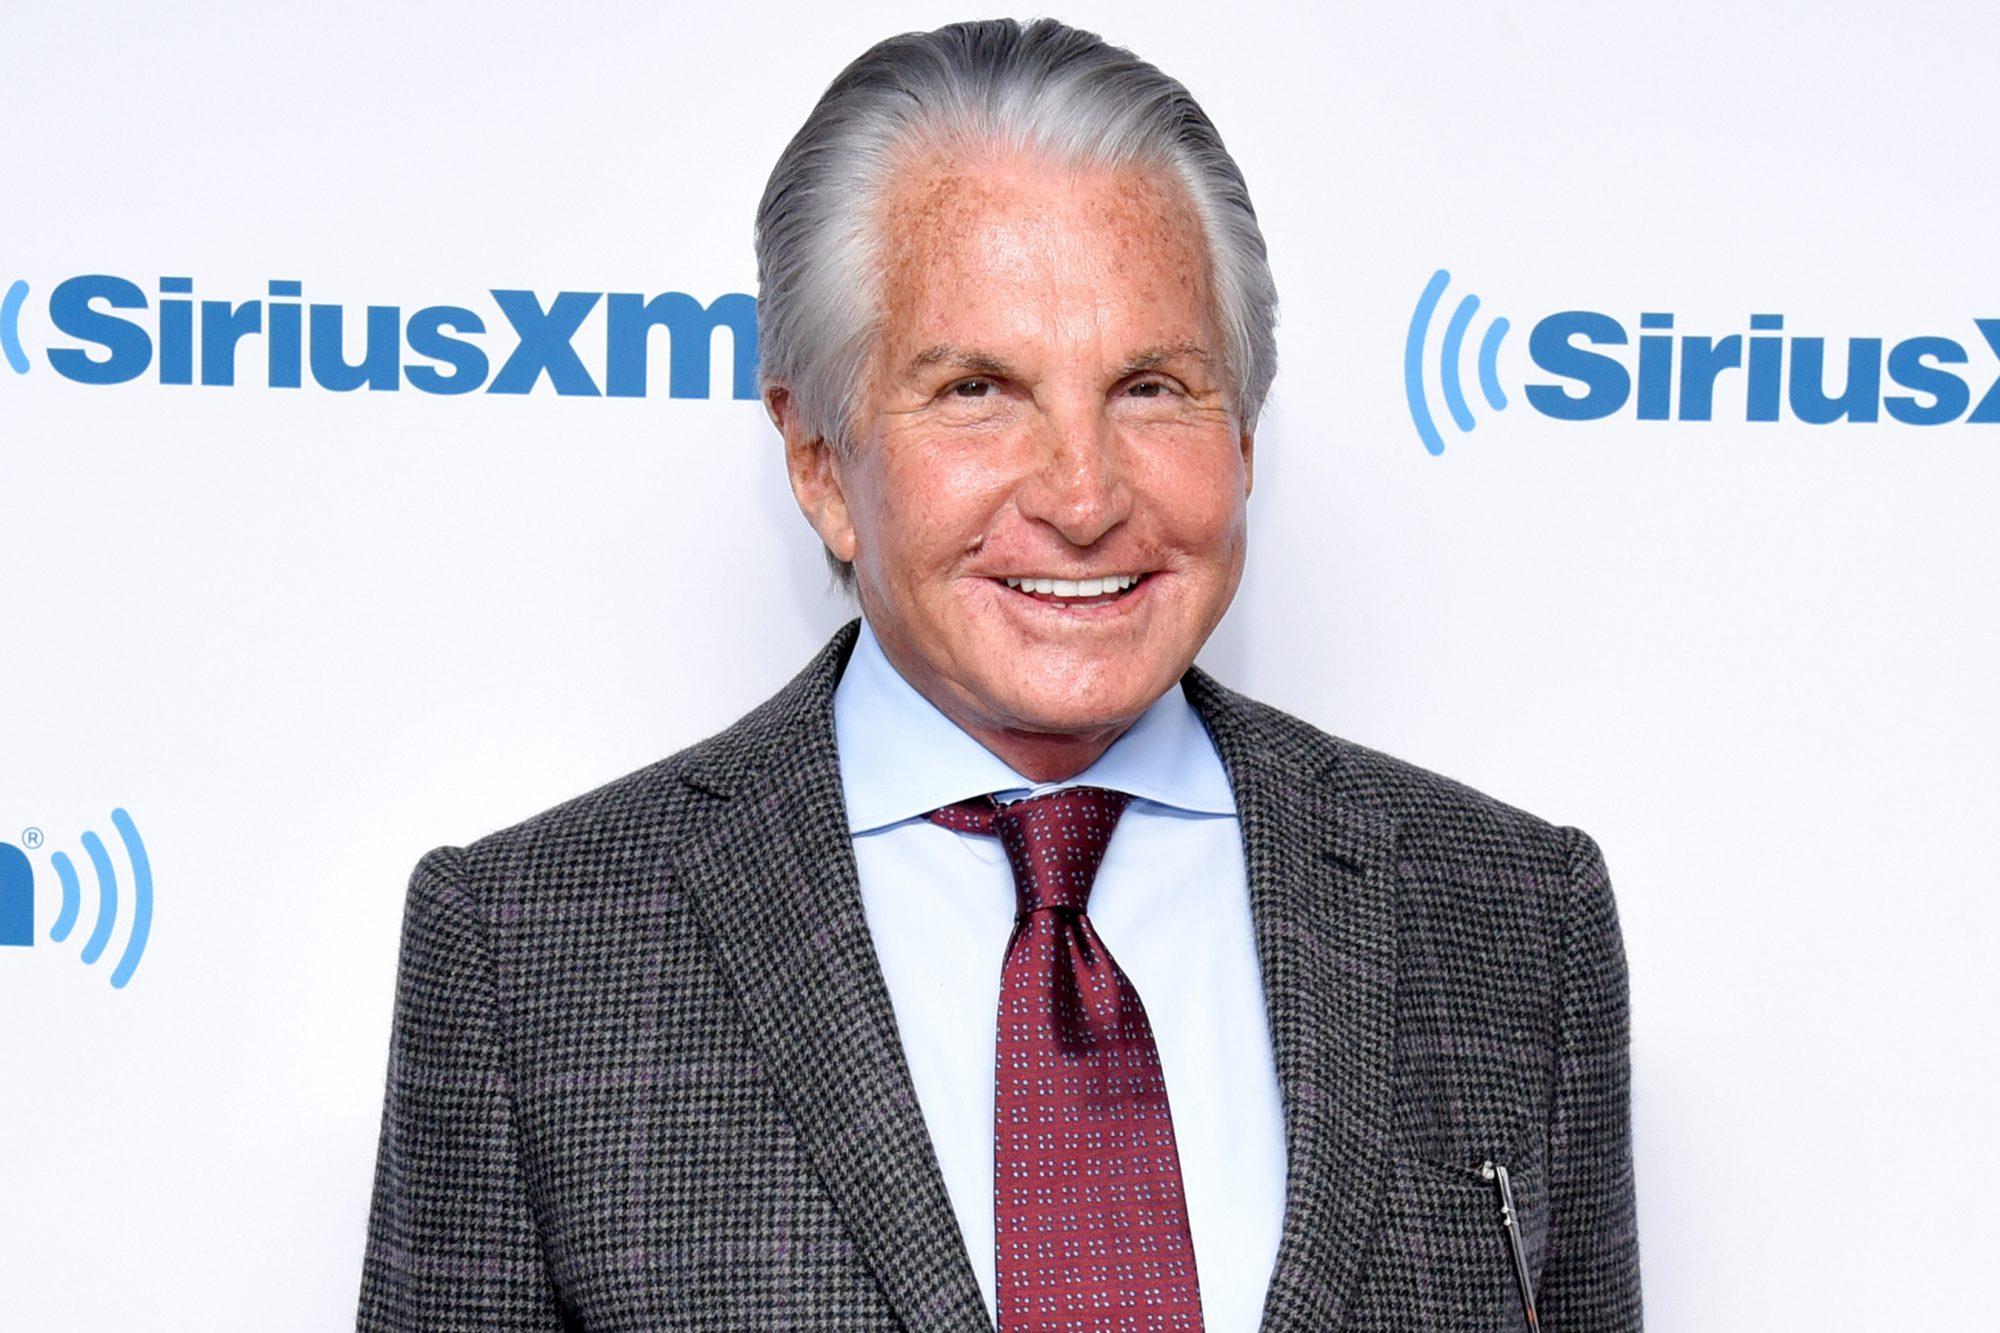 Celebrities Visit SiriusXM - March 30, 2017